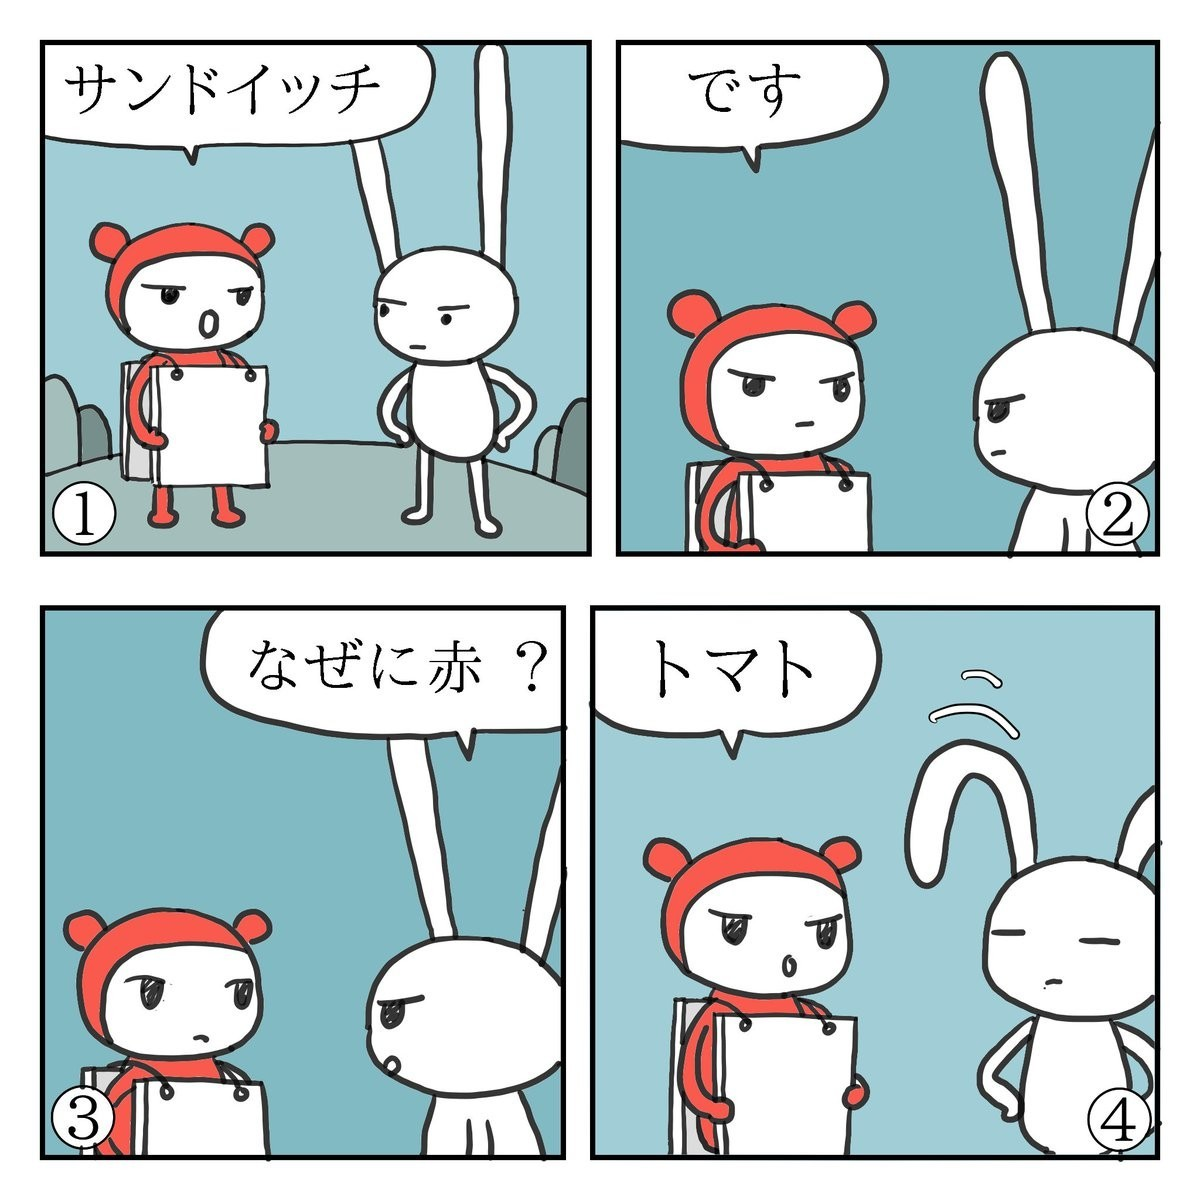 f:id:kanarihikokuma:20190315083435j:image:w320